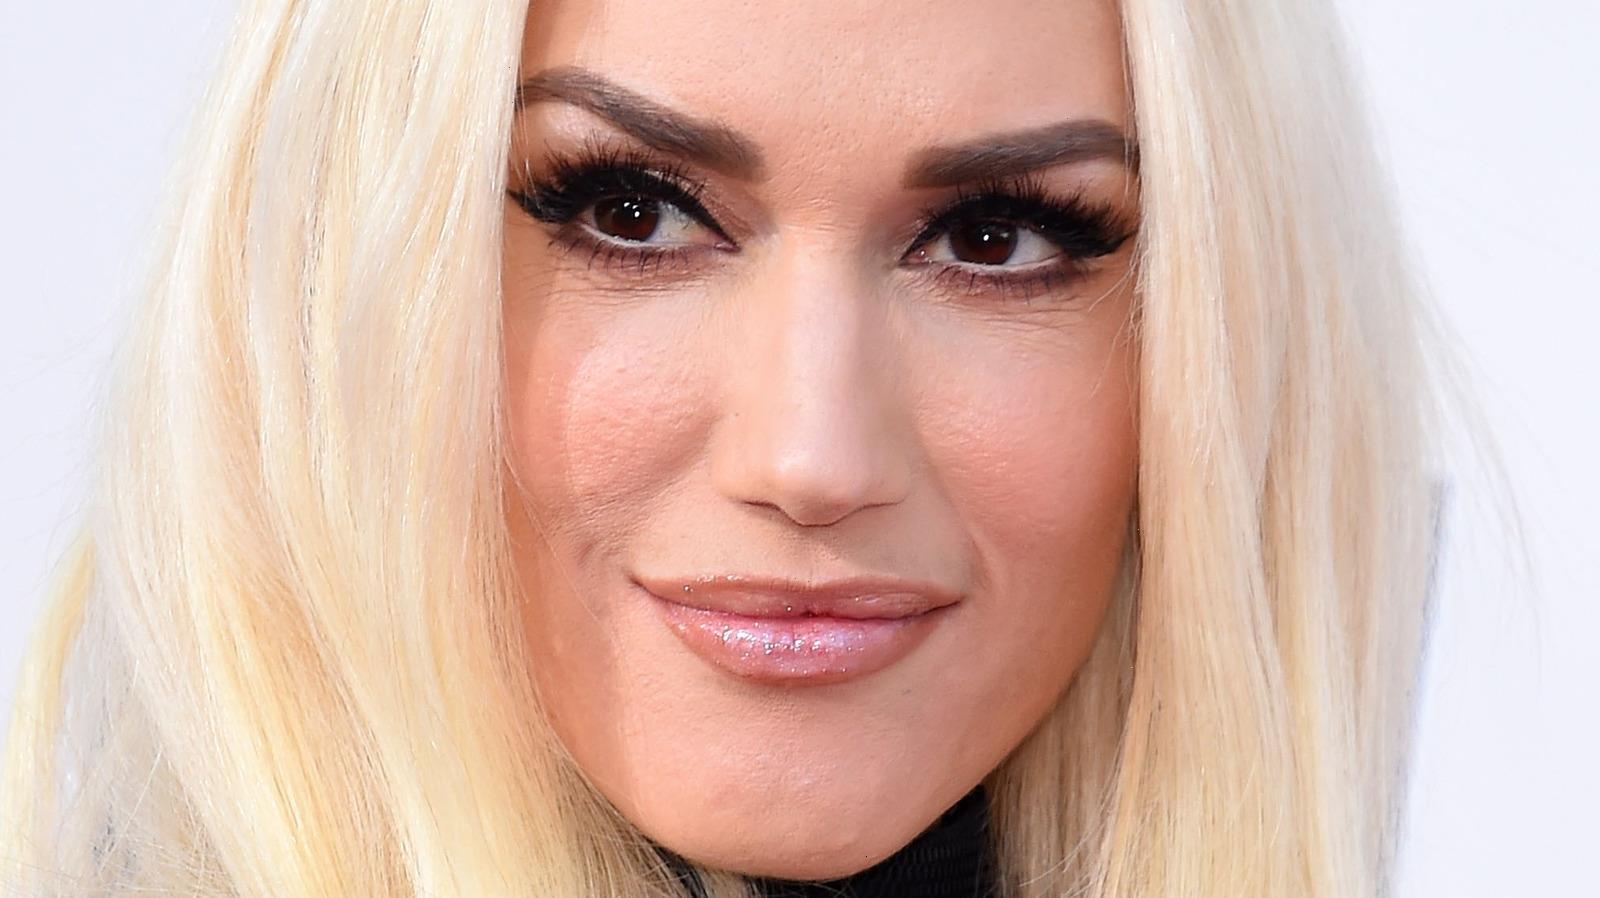 Gwen Stefani Shows Her Love For Her Husband Blake Shelton In An Unusual Way